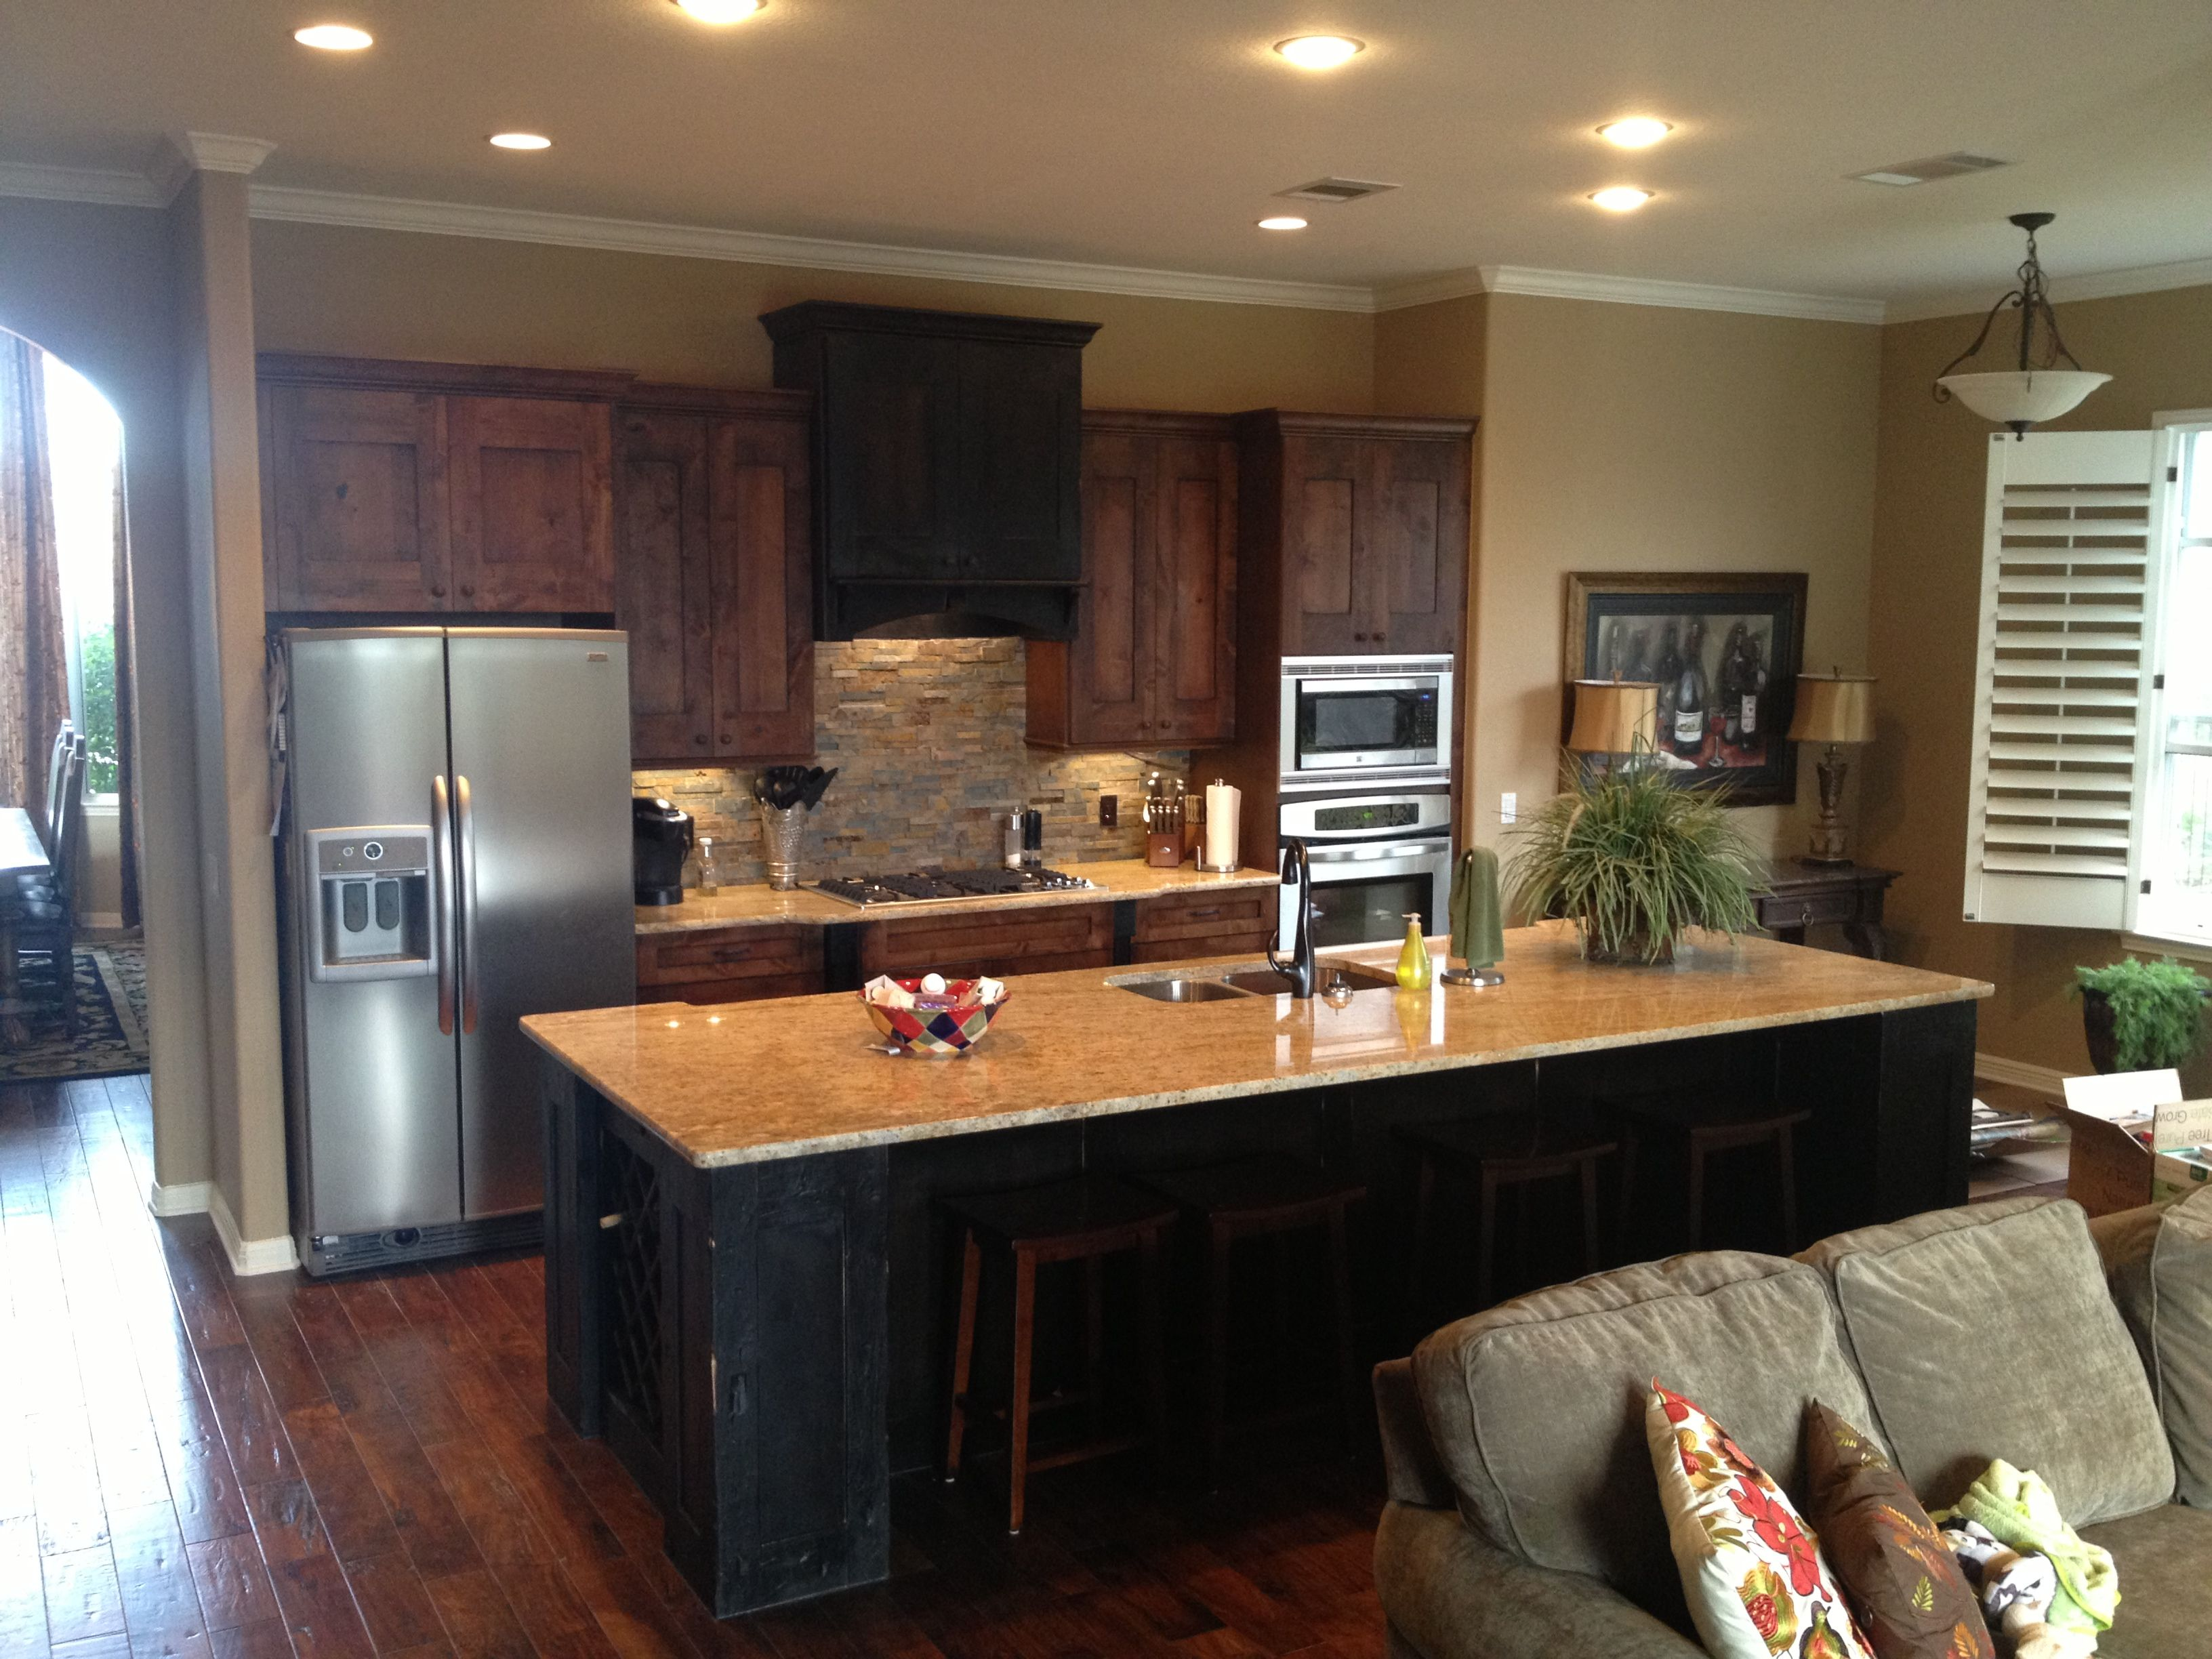 Rustic Alder Kitchen by Austin Budget Cabinets | Home ...